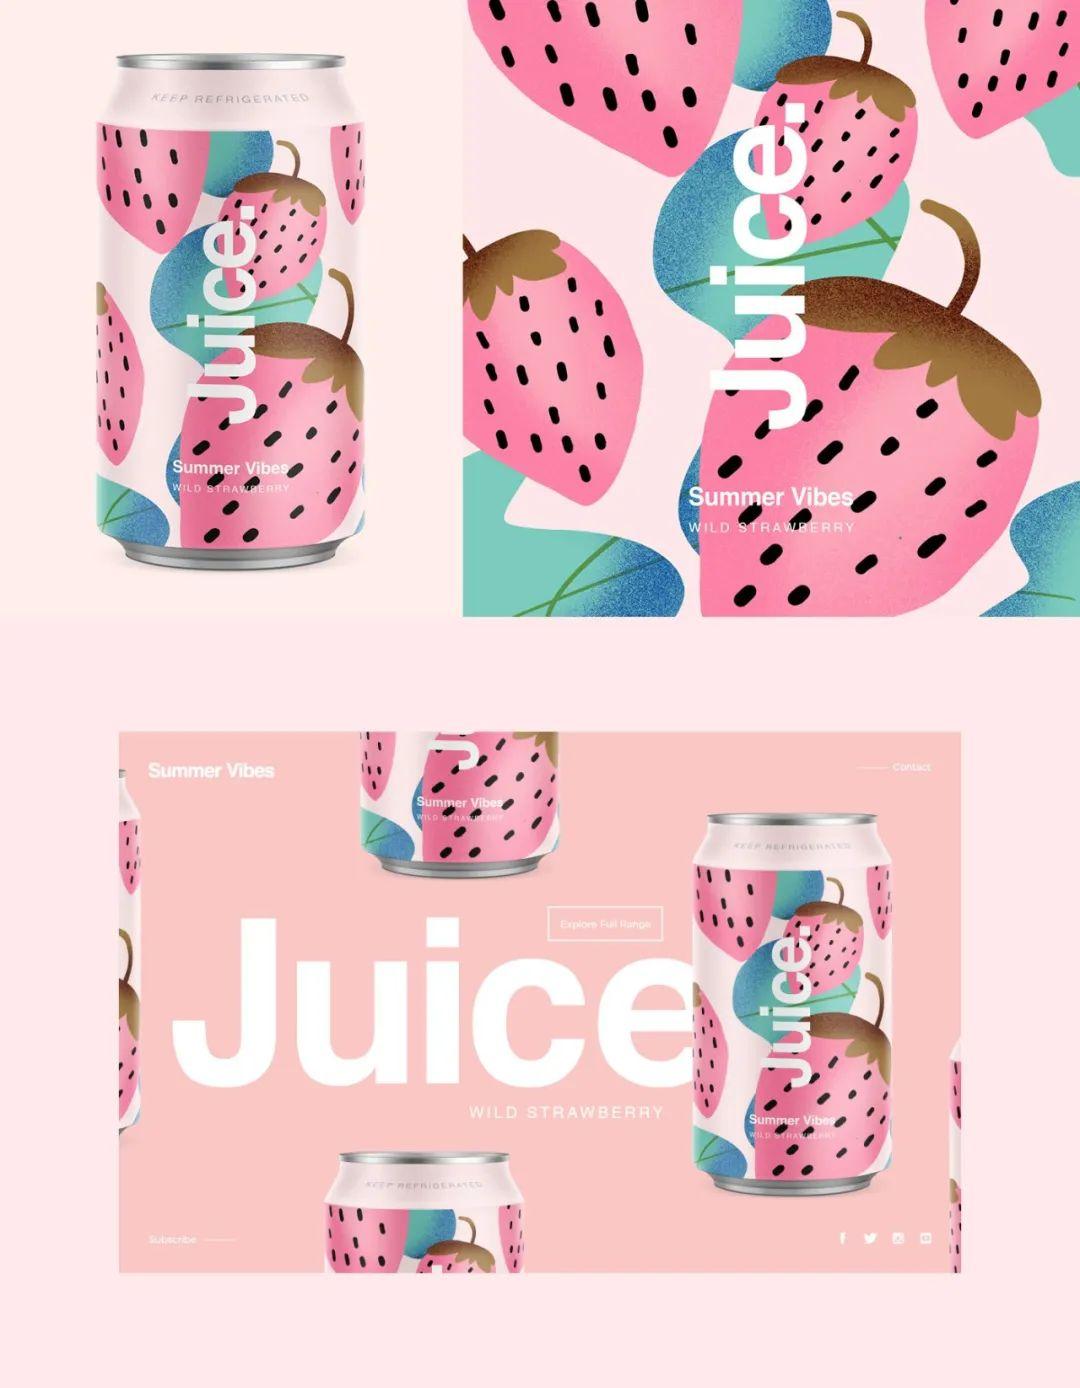 Adobe出饮料了?蓝莓味的PS,橙味的AI,黑加仑味的AE,你要哪个?